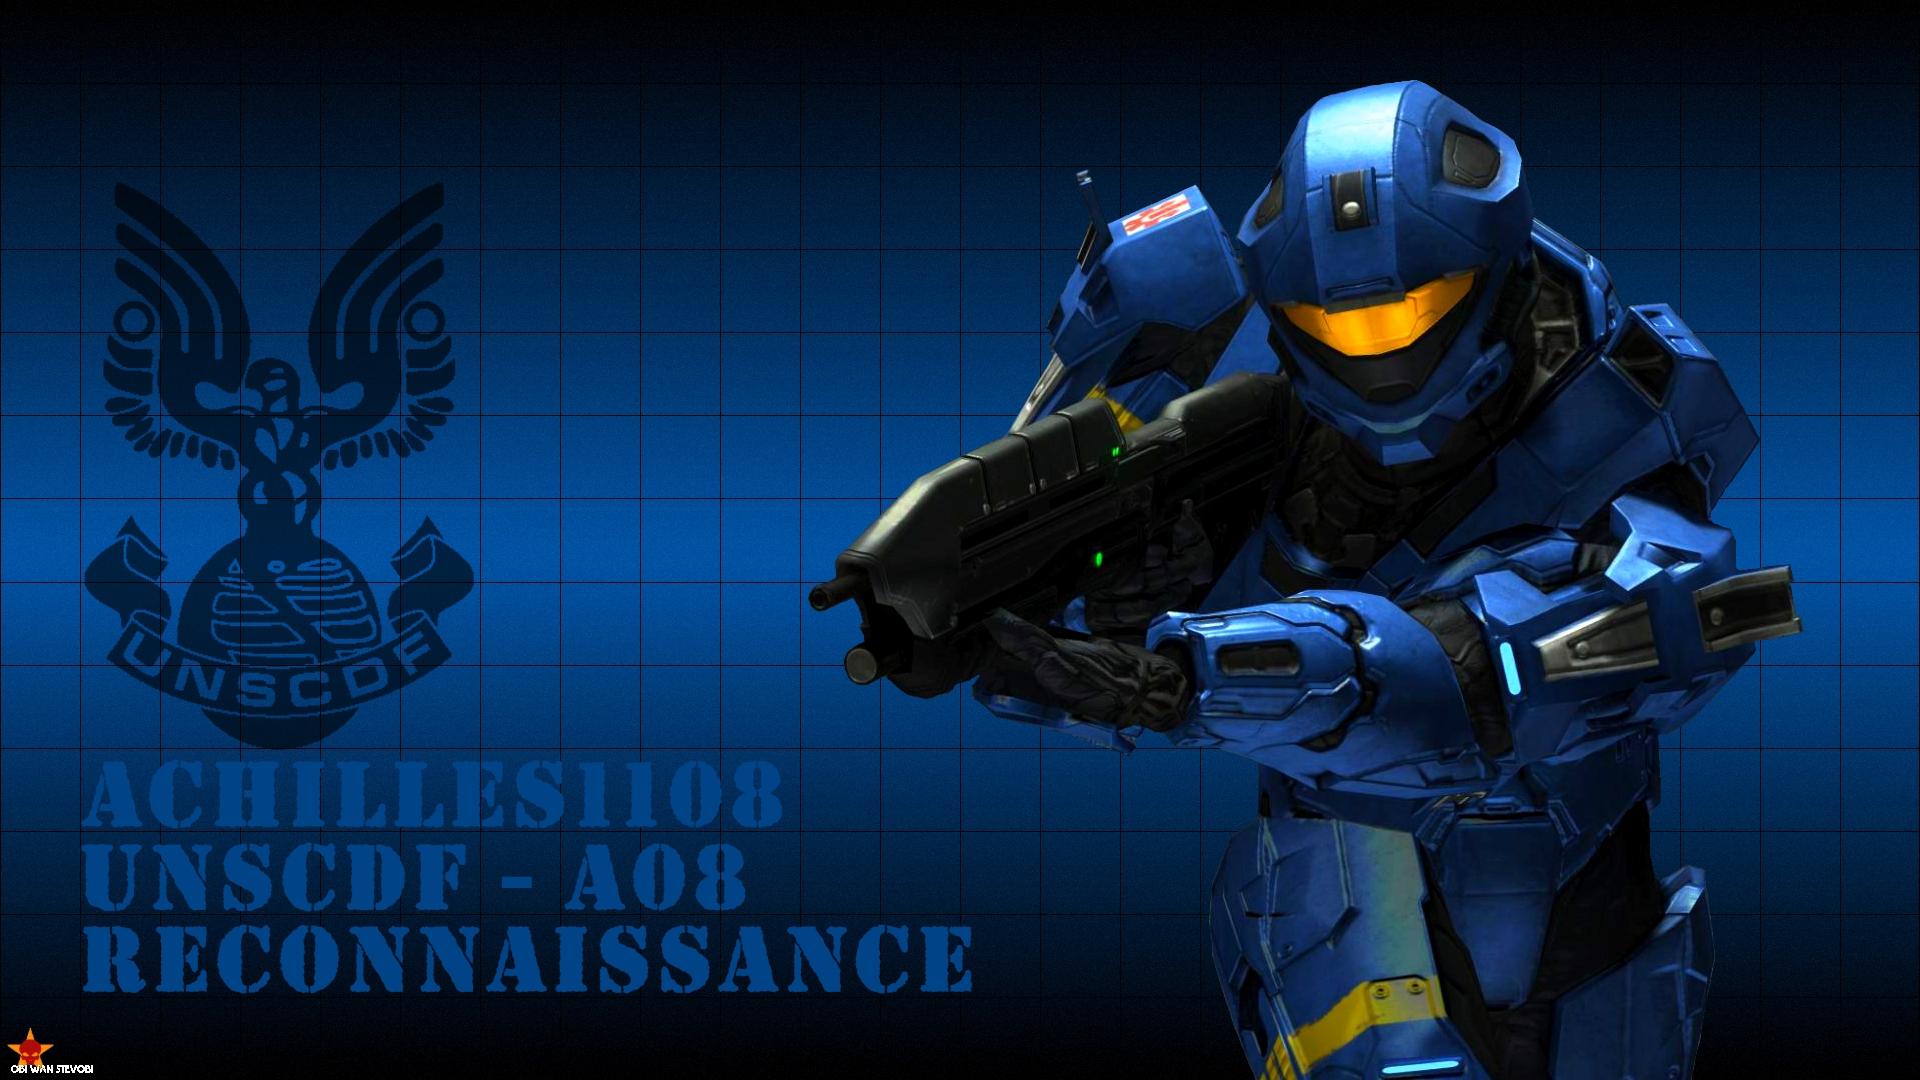 Animated halo wallpaper wallpapersafari - Halo 5 screensaver ...